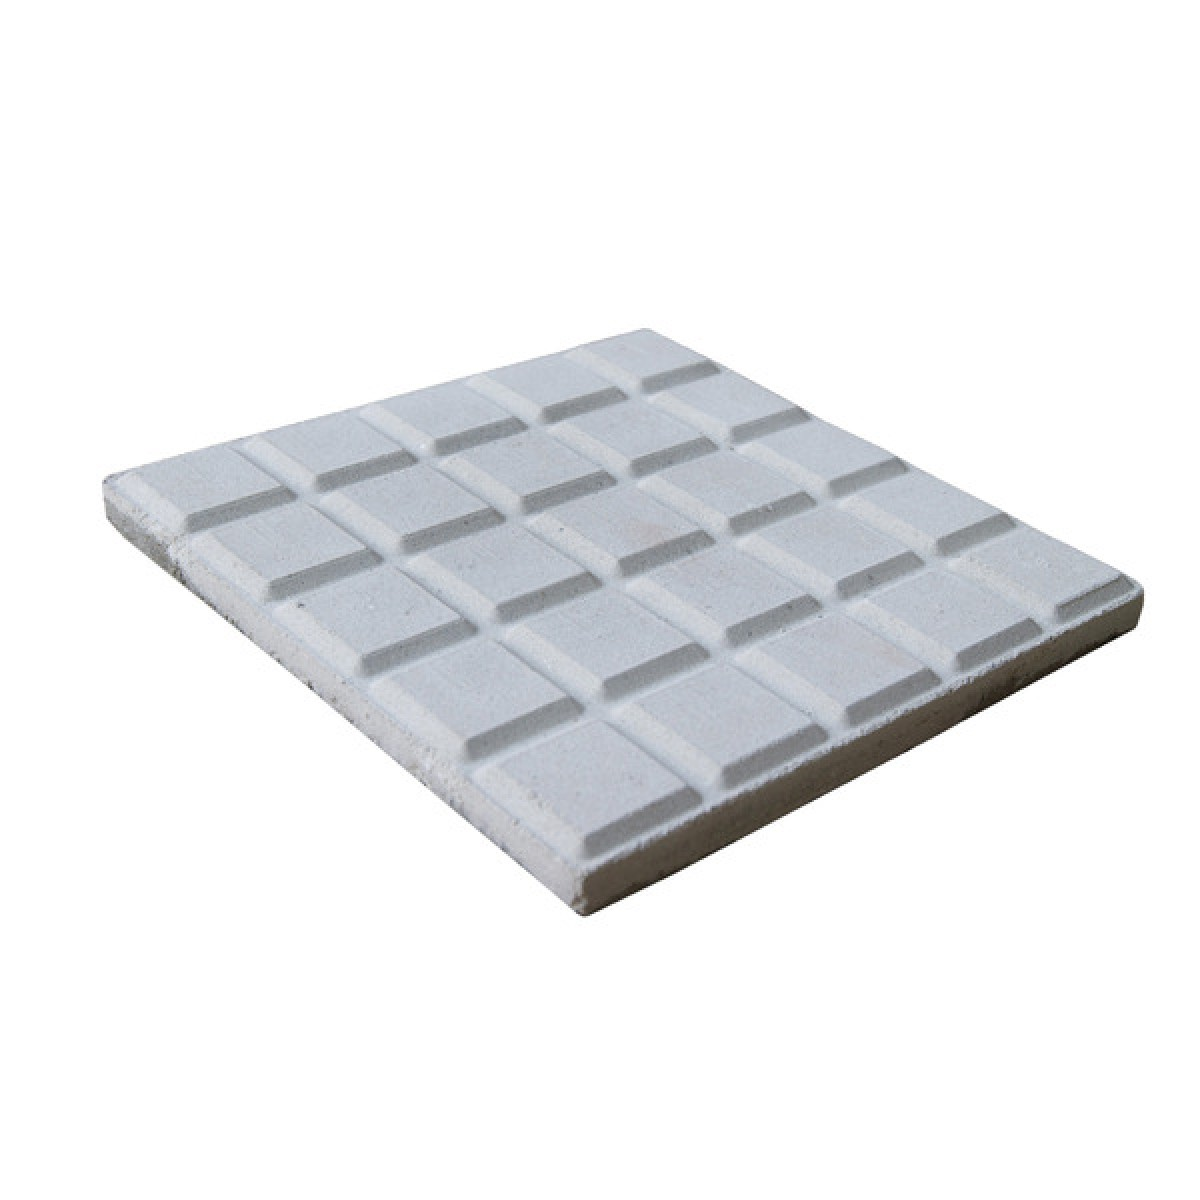 Foto4 - Forma Plástica Para Ladrilho Xadrez 25 Quadros FP044 20X20X1,5 Rendimento 25PÇAS P/M²